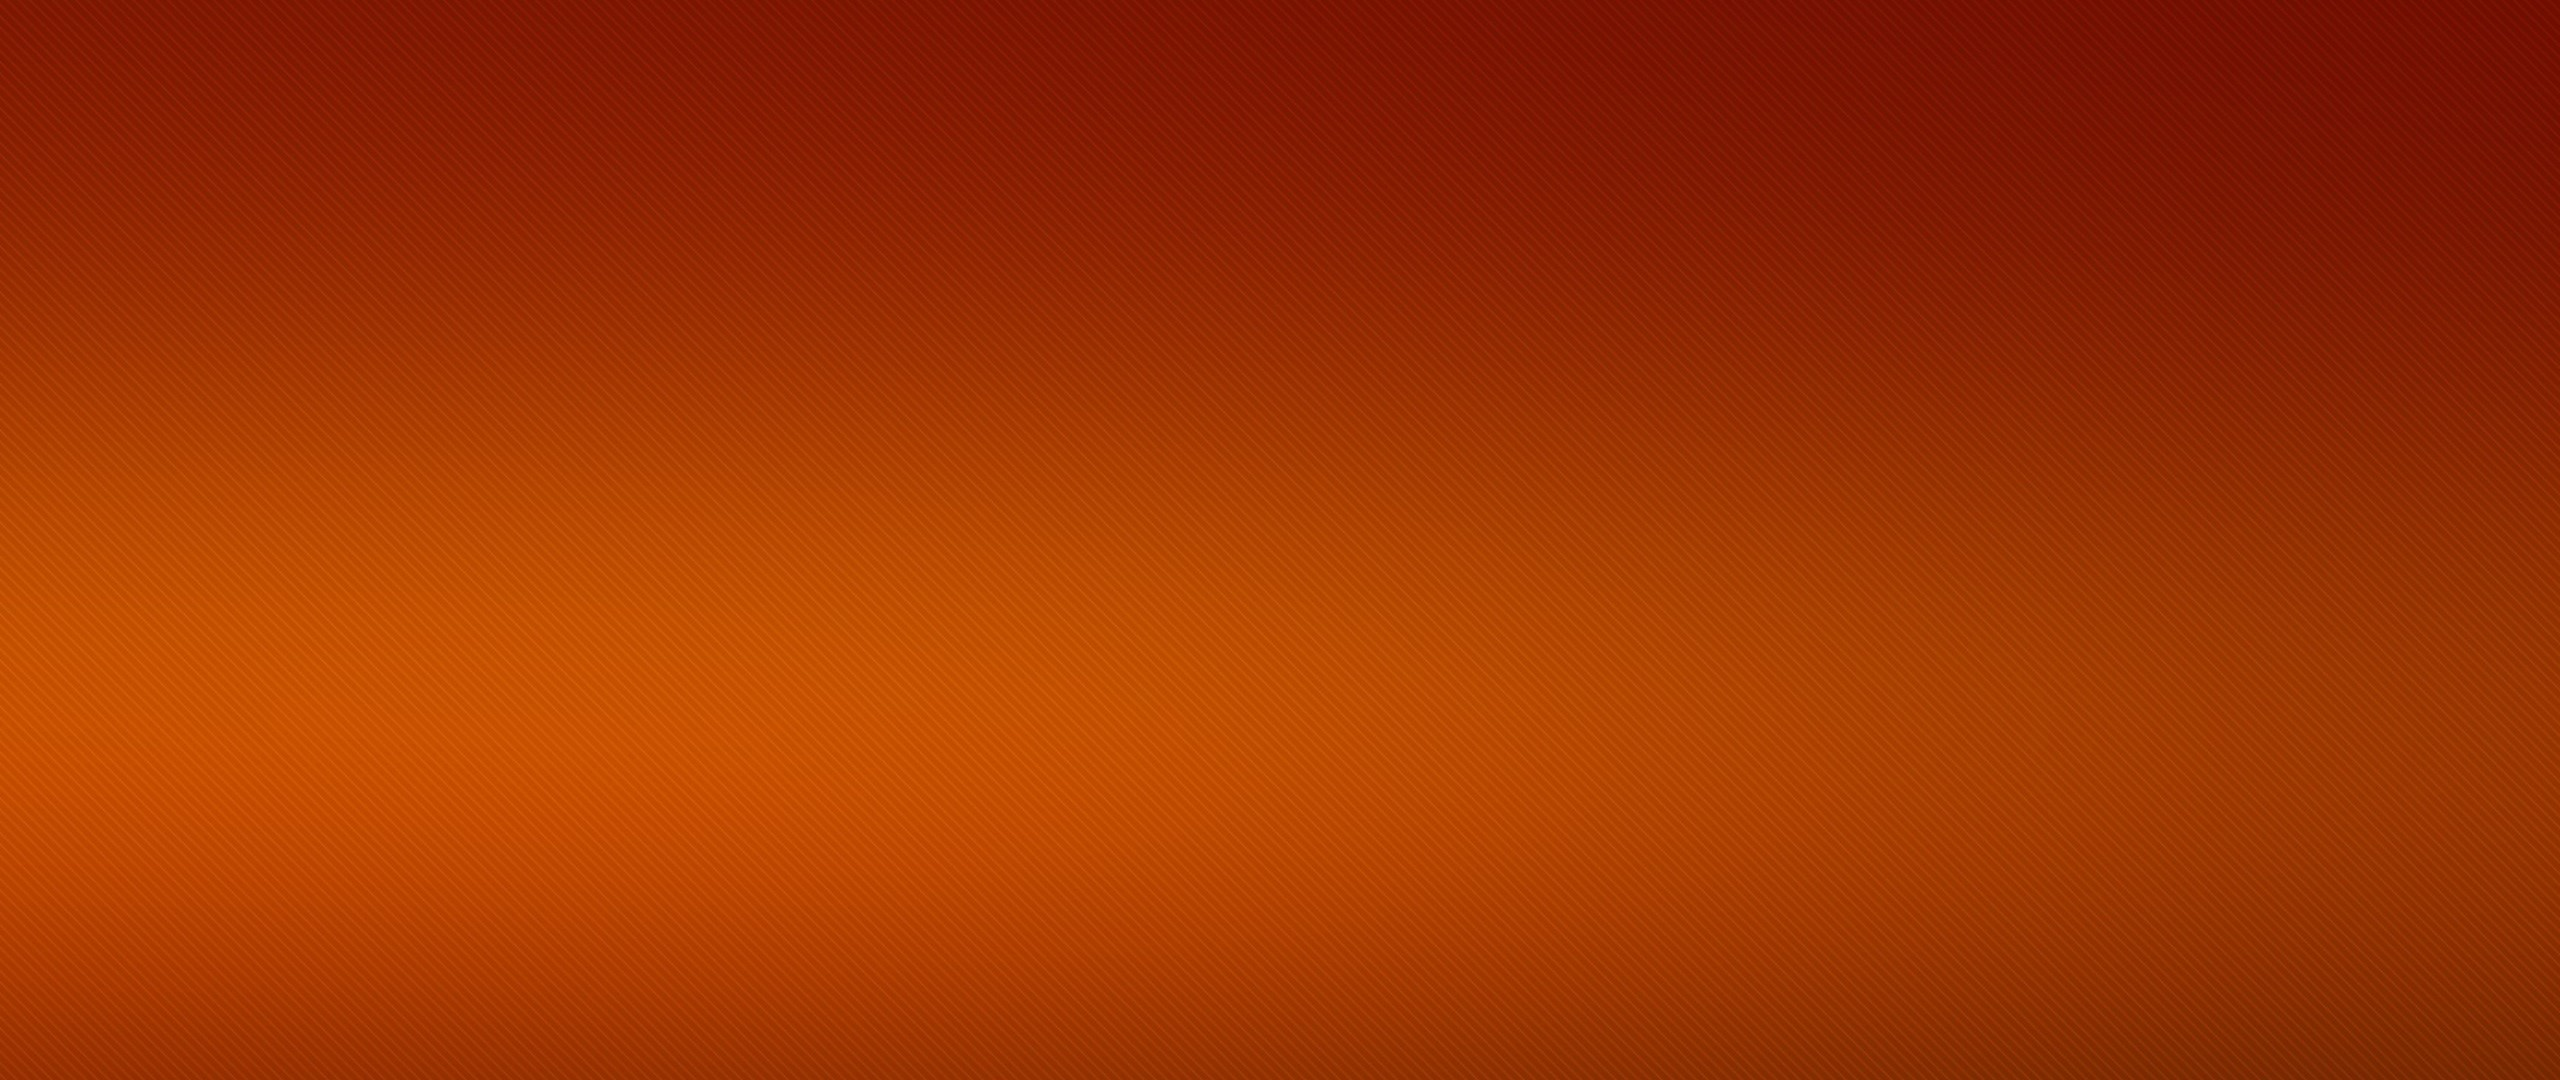 Wallpaper solid, color, bright, lines